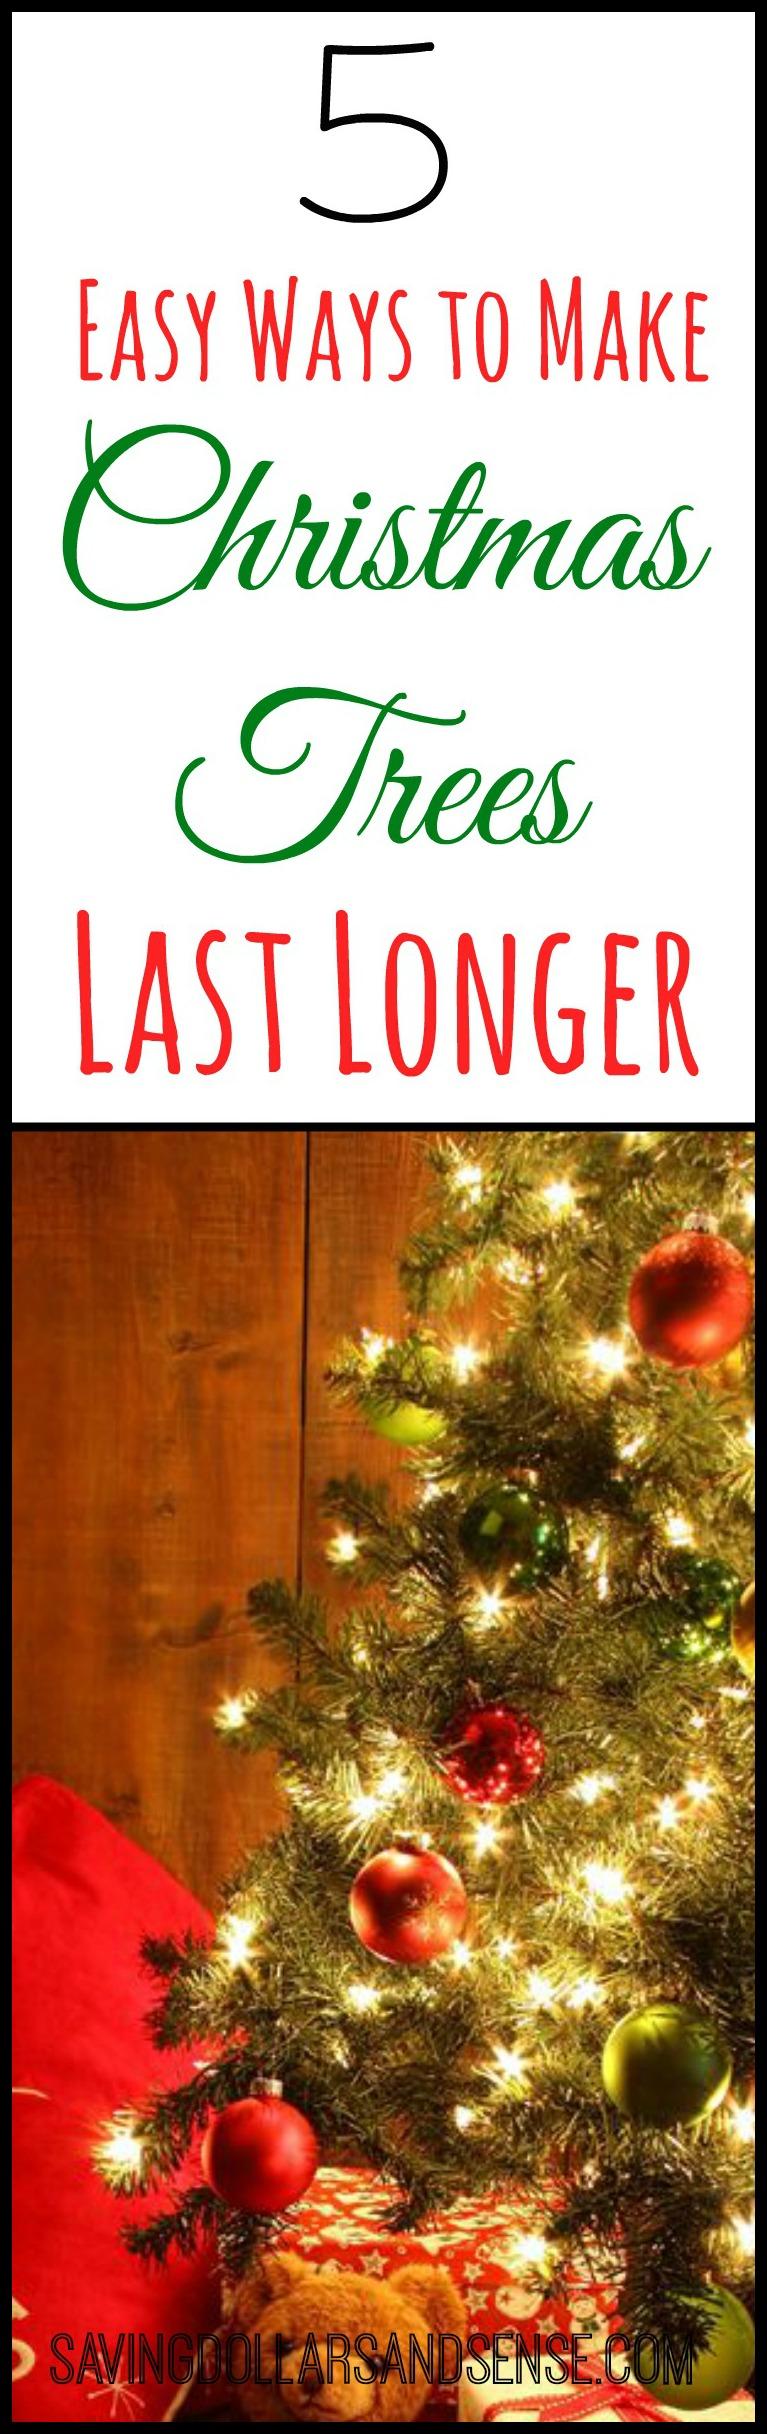 How to Make Christmas Trees Last Longer | Light decorations ...